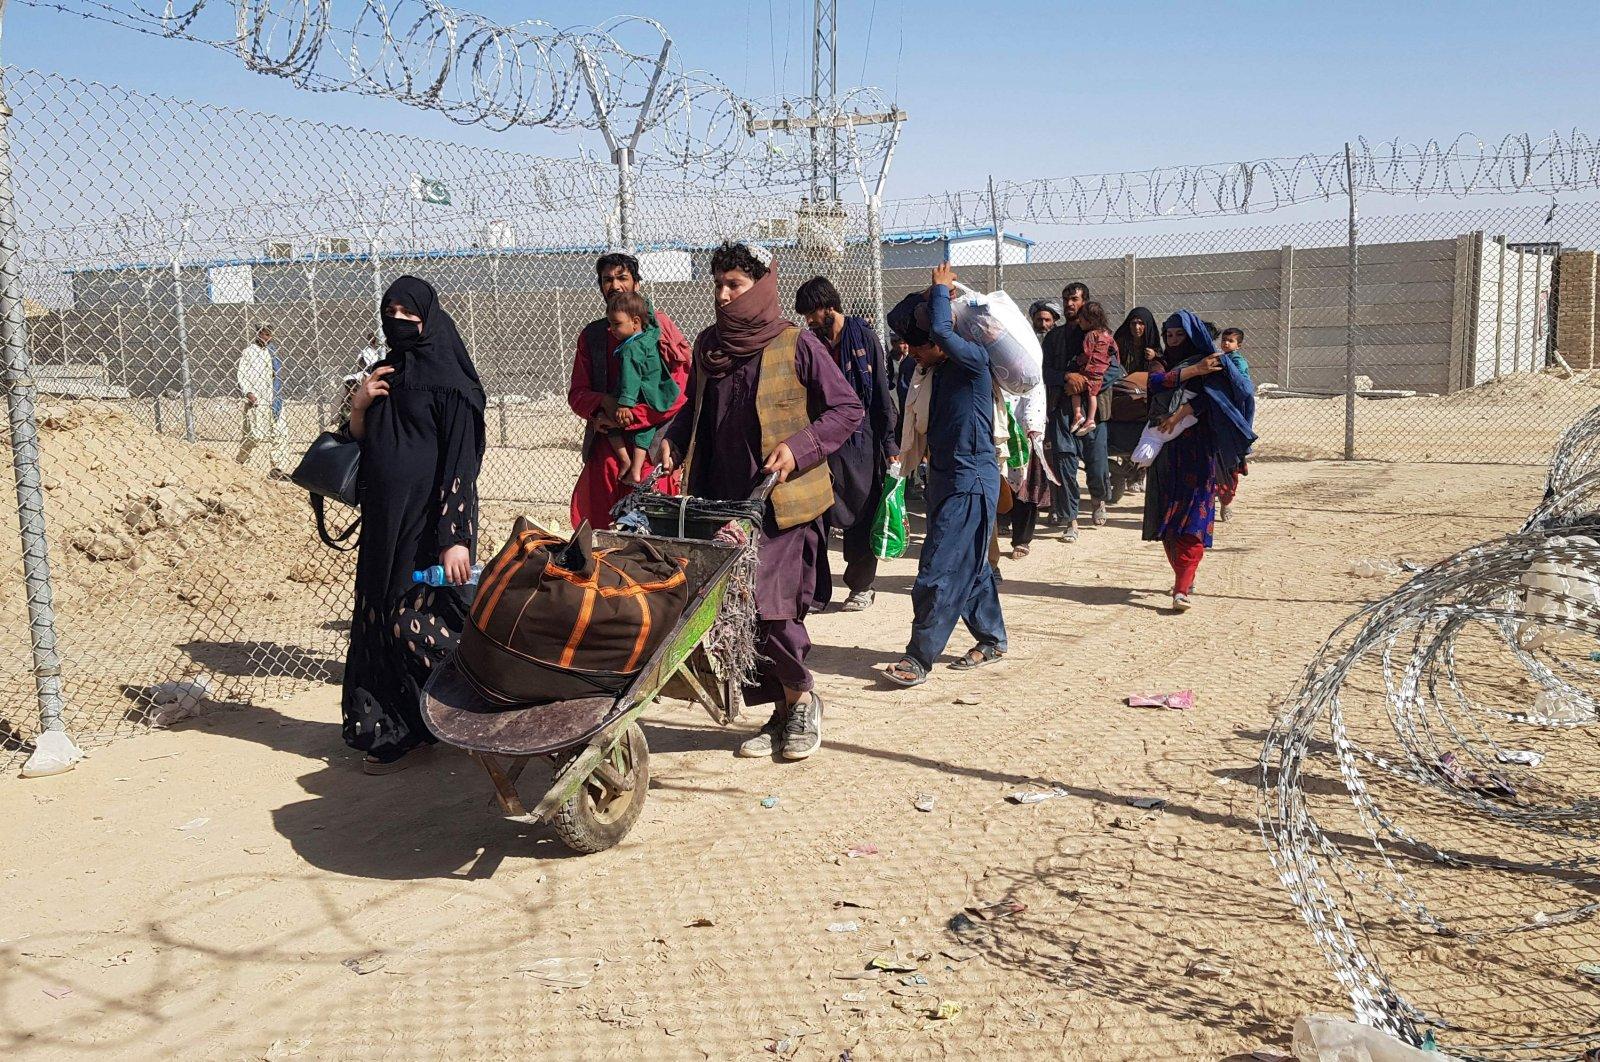 Afghan nationals cross the border into Pakistan at the Pakistan-Afghanistan border crossing in Chaman, Pakistan, on Aug. 18, 2021. (AFP Photo)